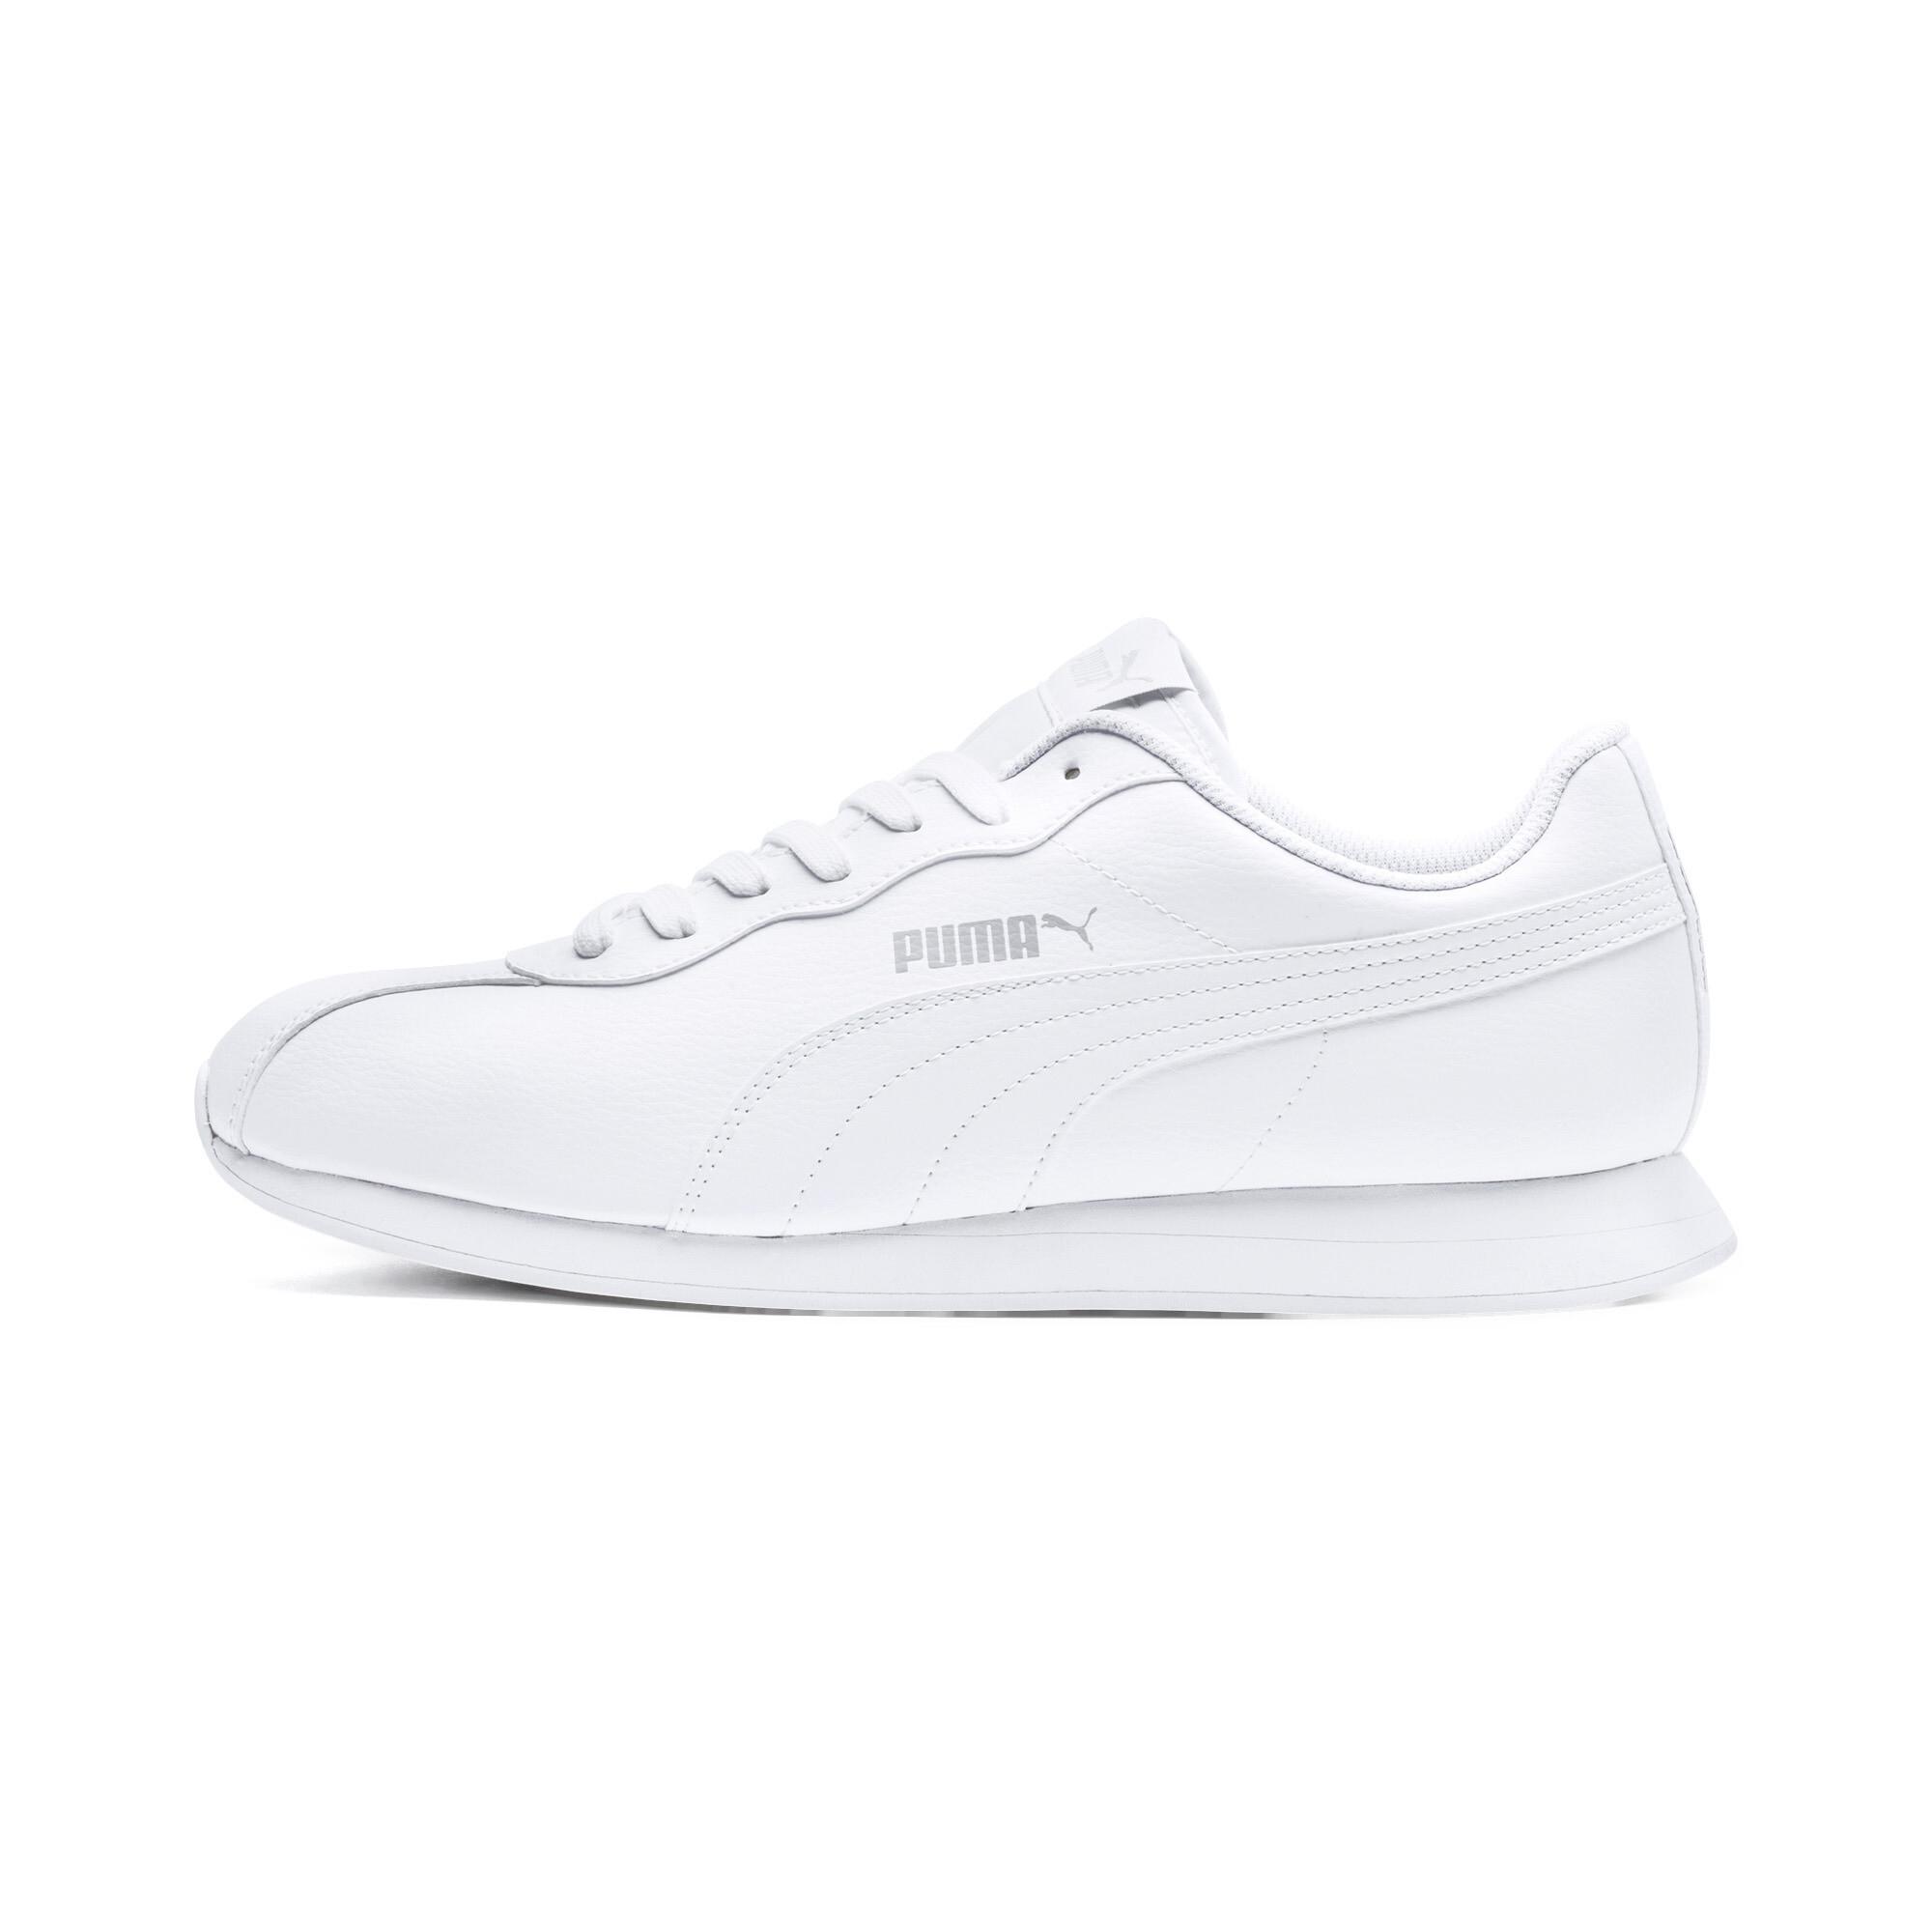 PUMA-Men-039-s-Turin-II-Sneakers thumbnail 10